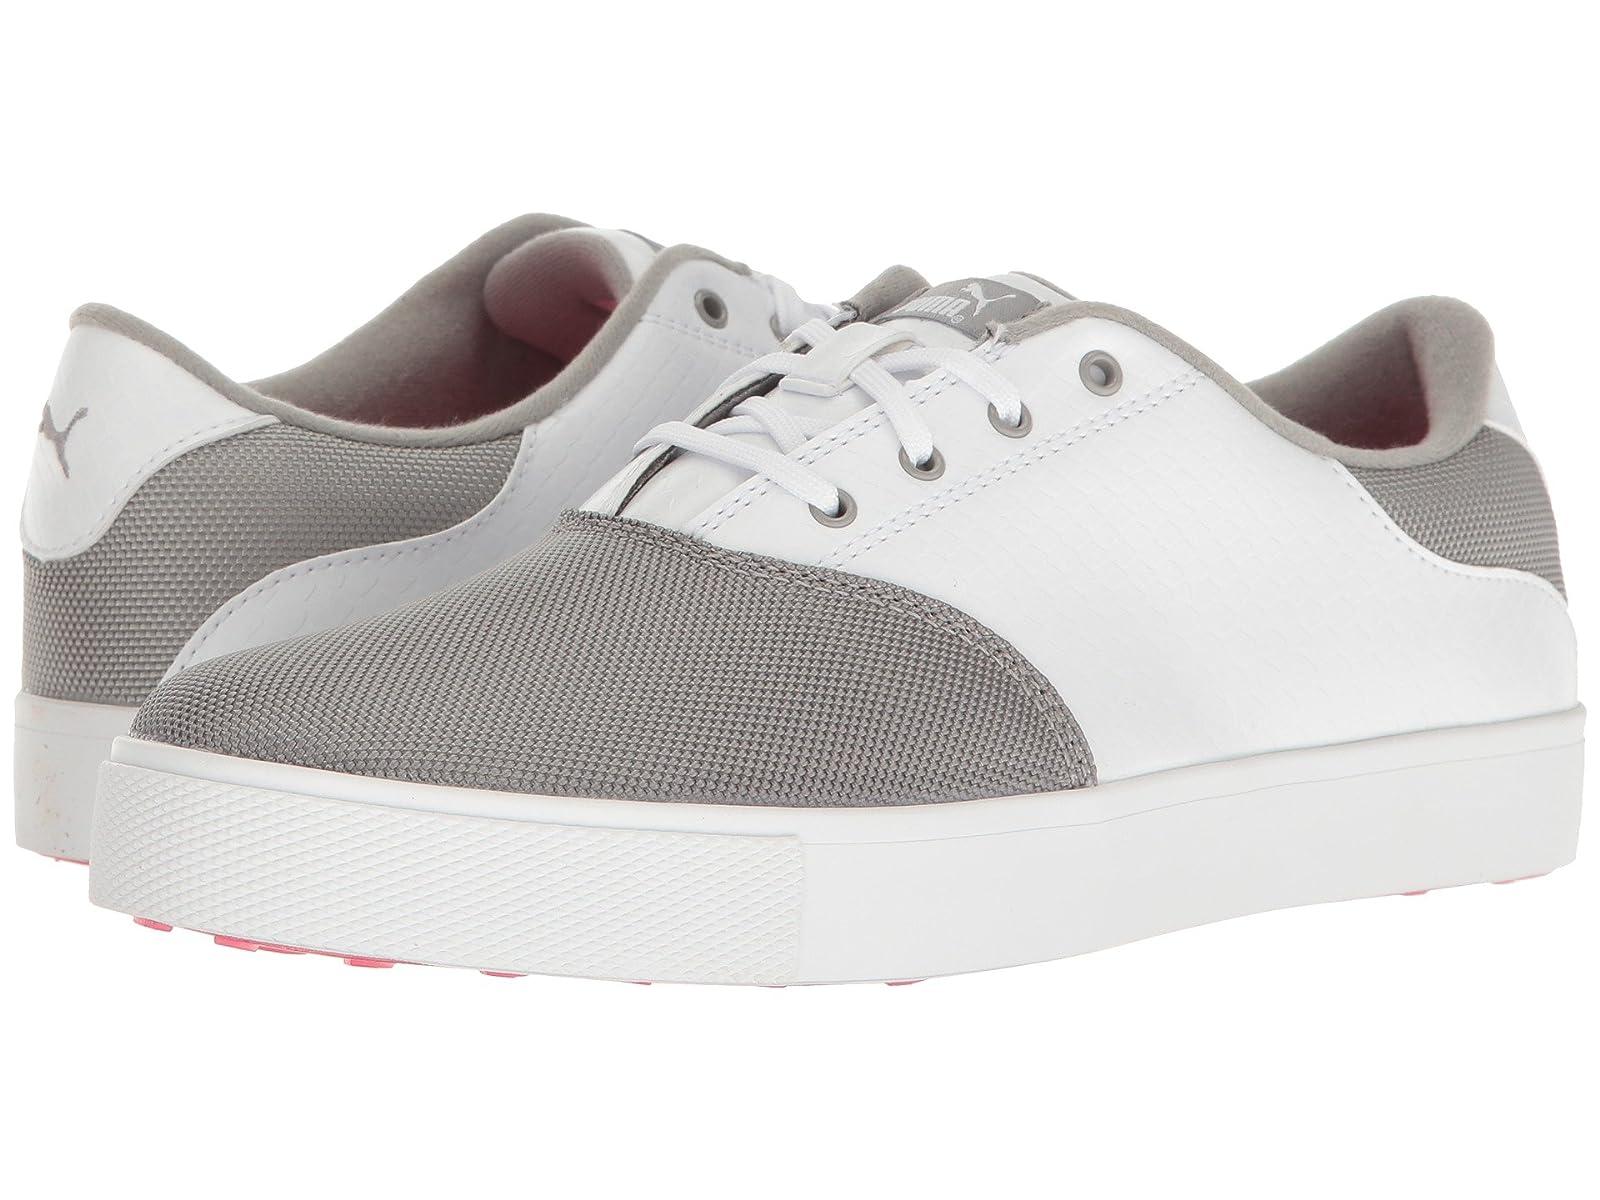 PUMA Golf Tustin SaddleAtmospheric grades have affordable shoes